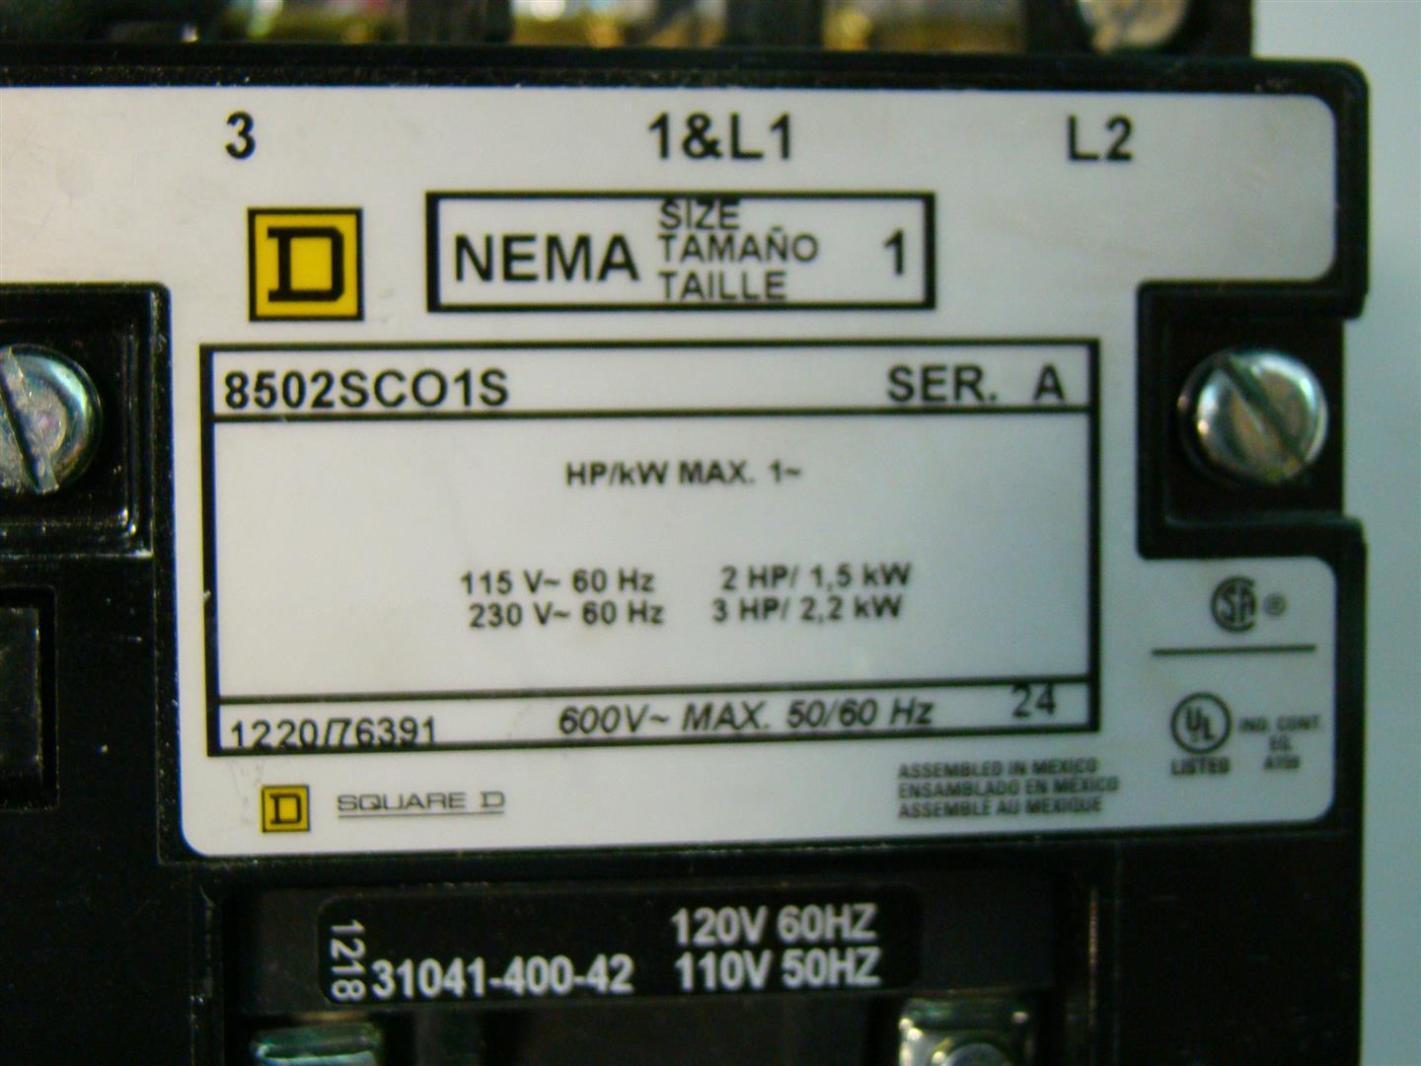 Motor Starter Size Square D Nema 1 Wiring Diagram Phase 120v Coil 2hp 5kw